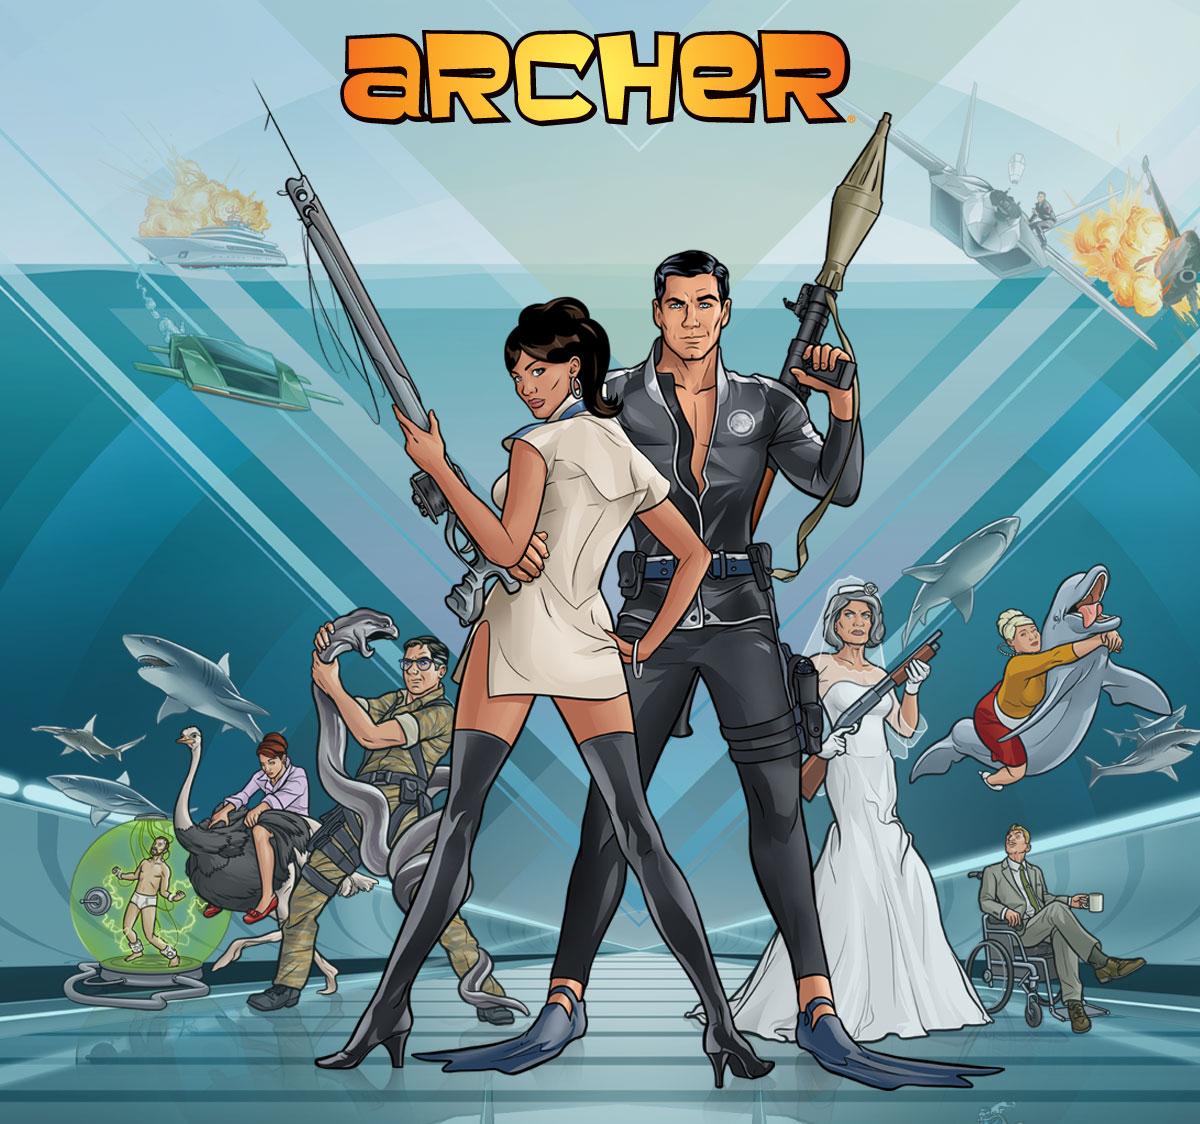 FX Gives 'Archer' Season 5 Mission